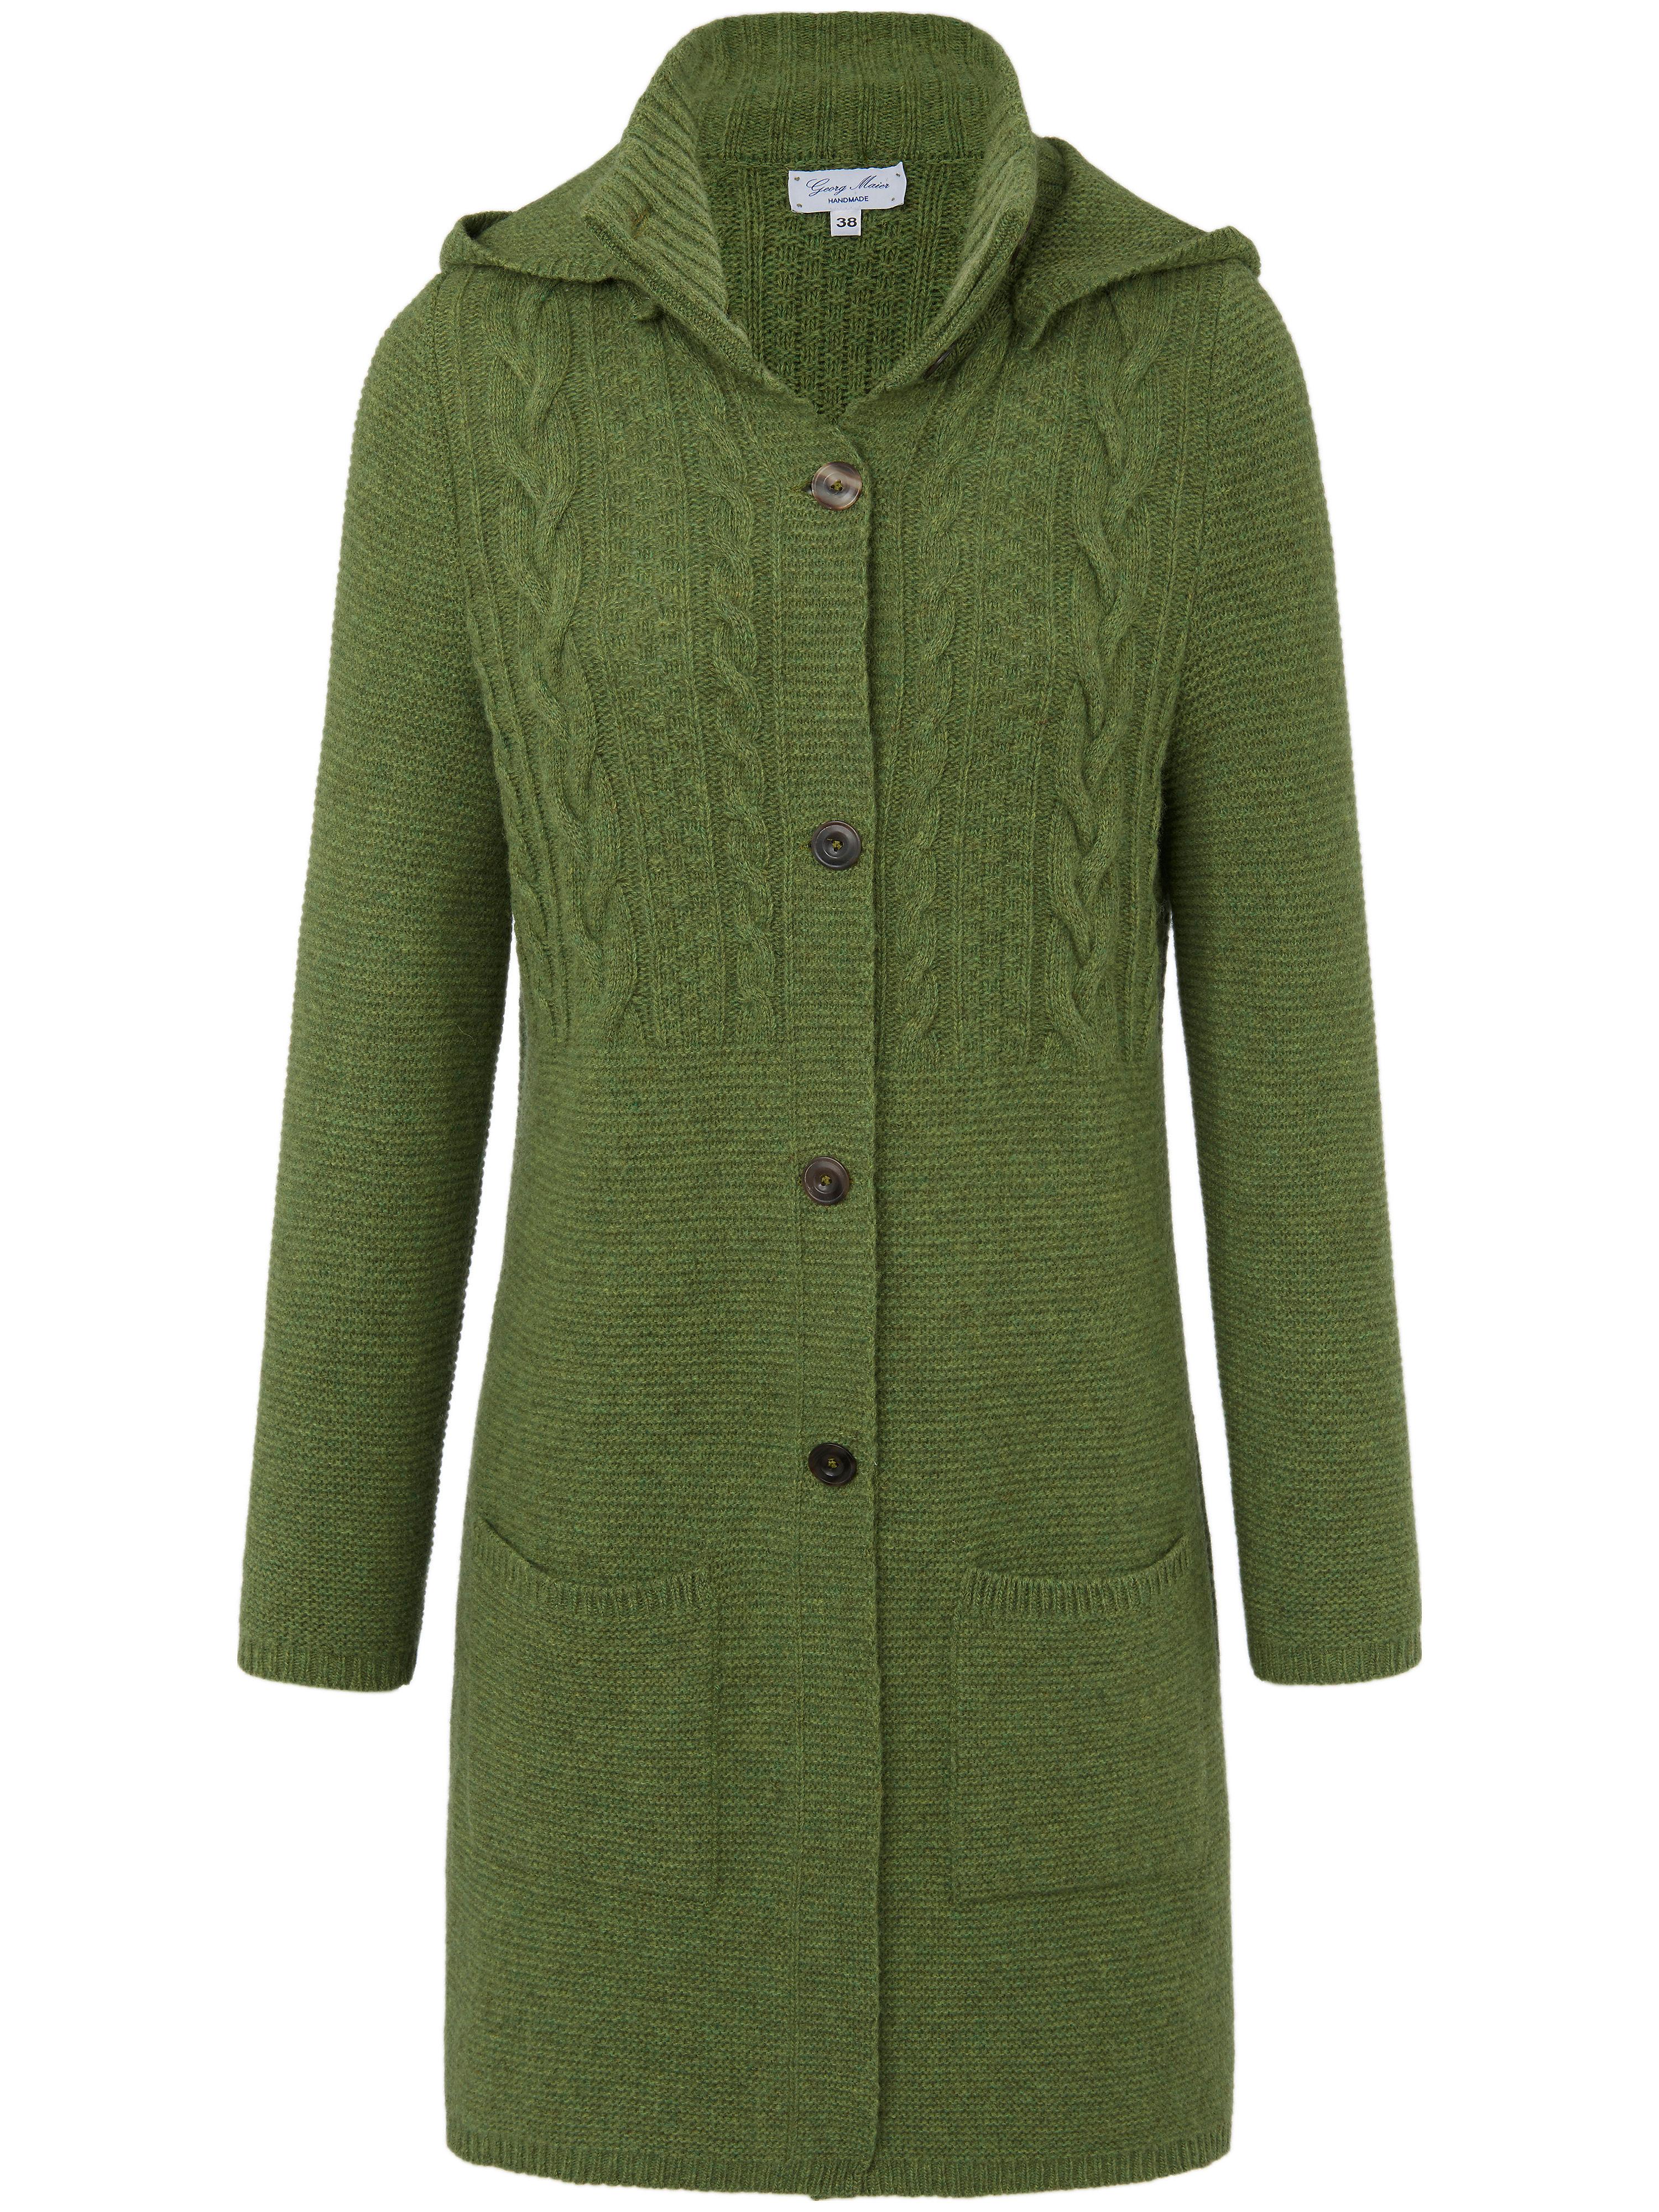 Le manteau maille 100% laine vierge  Georg Maier vert taille 50